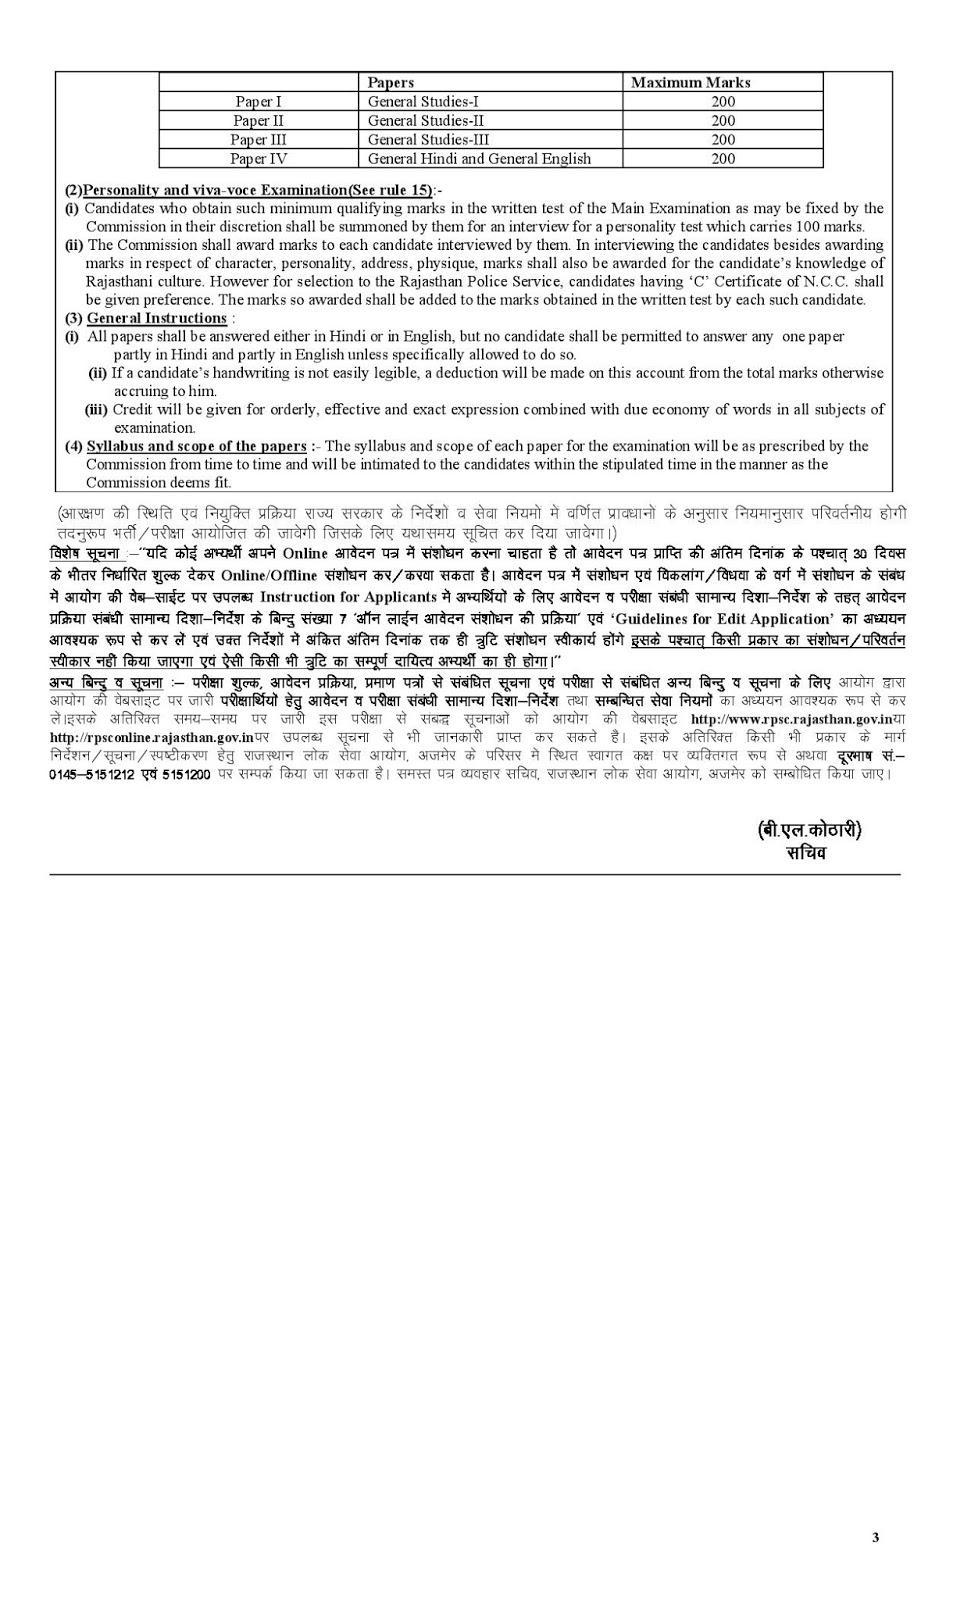 kaptan meena 2016 online application can be apply via rpsc online web portal rpsconline rajasthan gov in starting date 10 2016 last date 25 2016